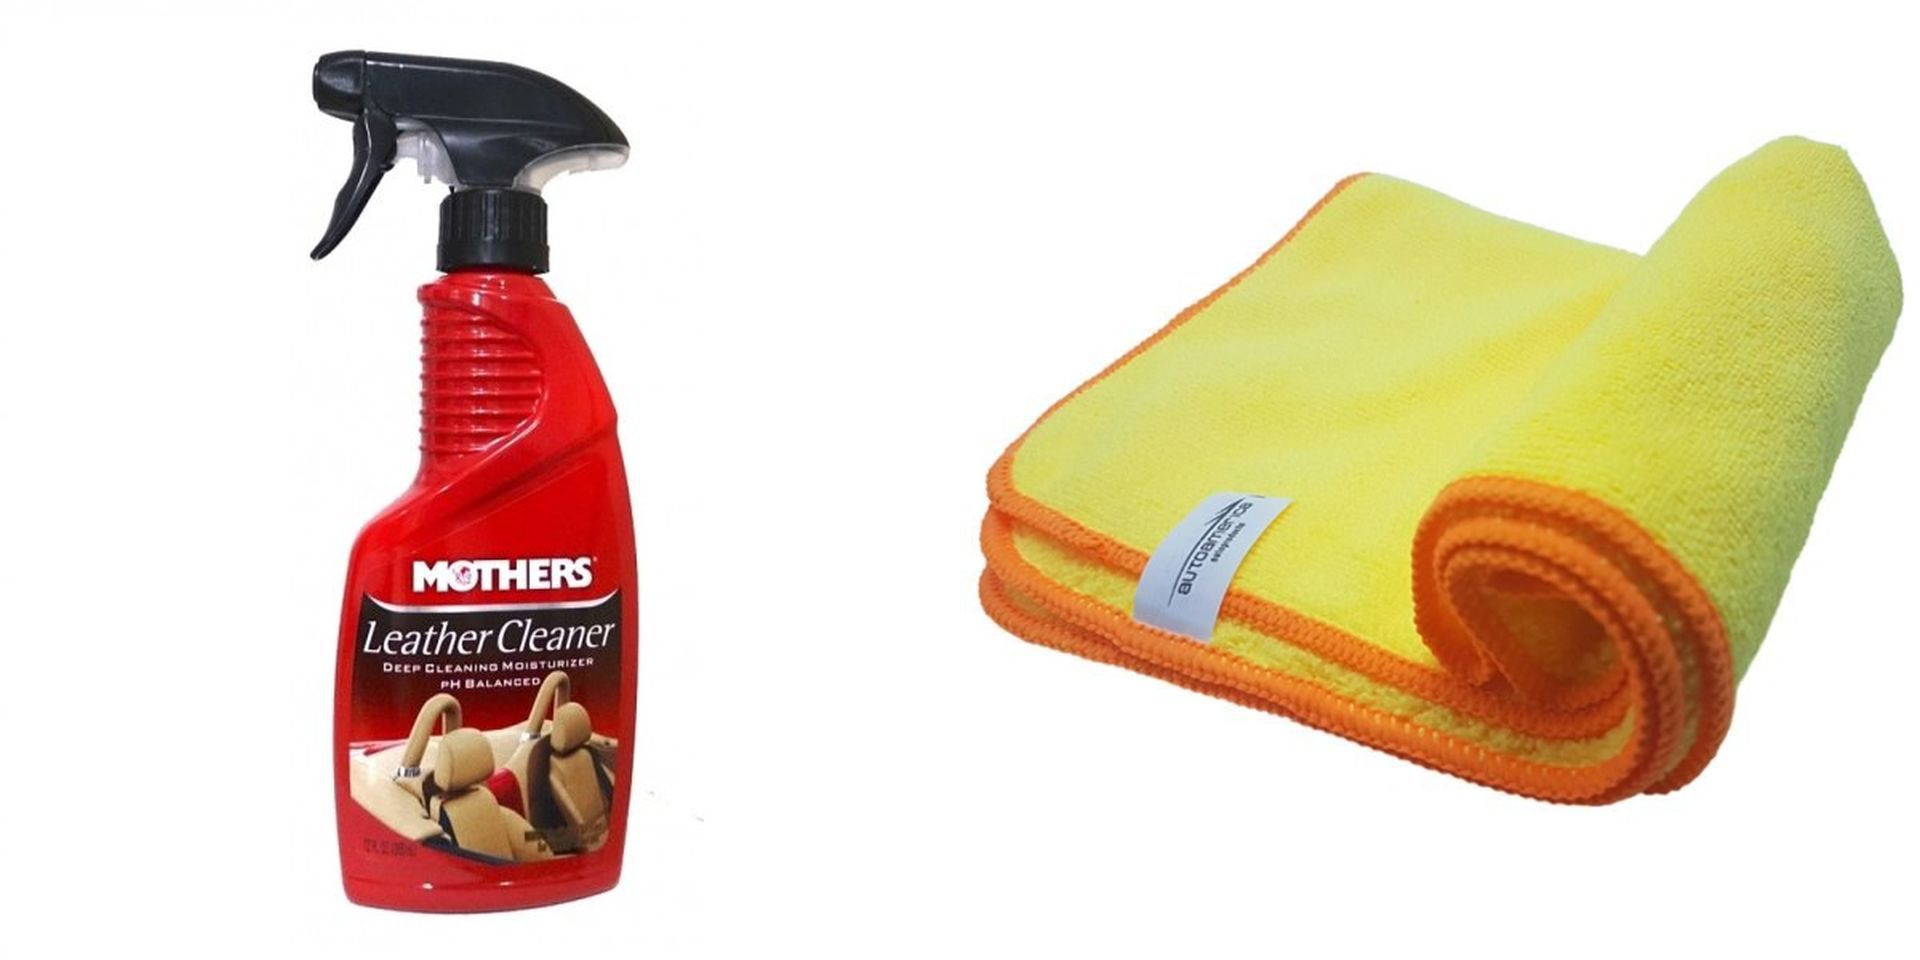 Leather Cleaner + Flanela 40x60 Autoamerica